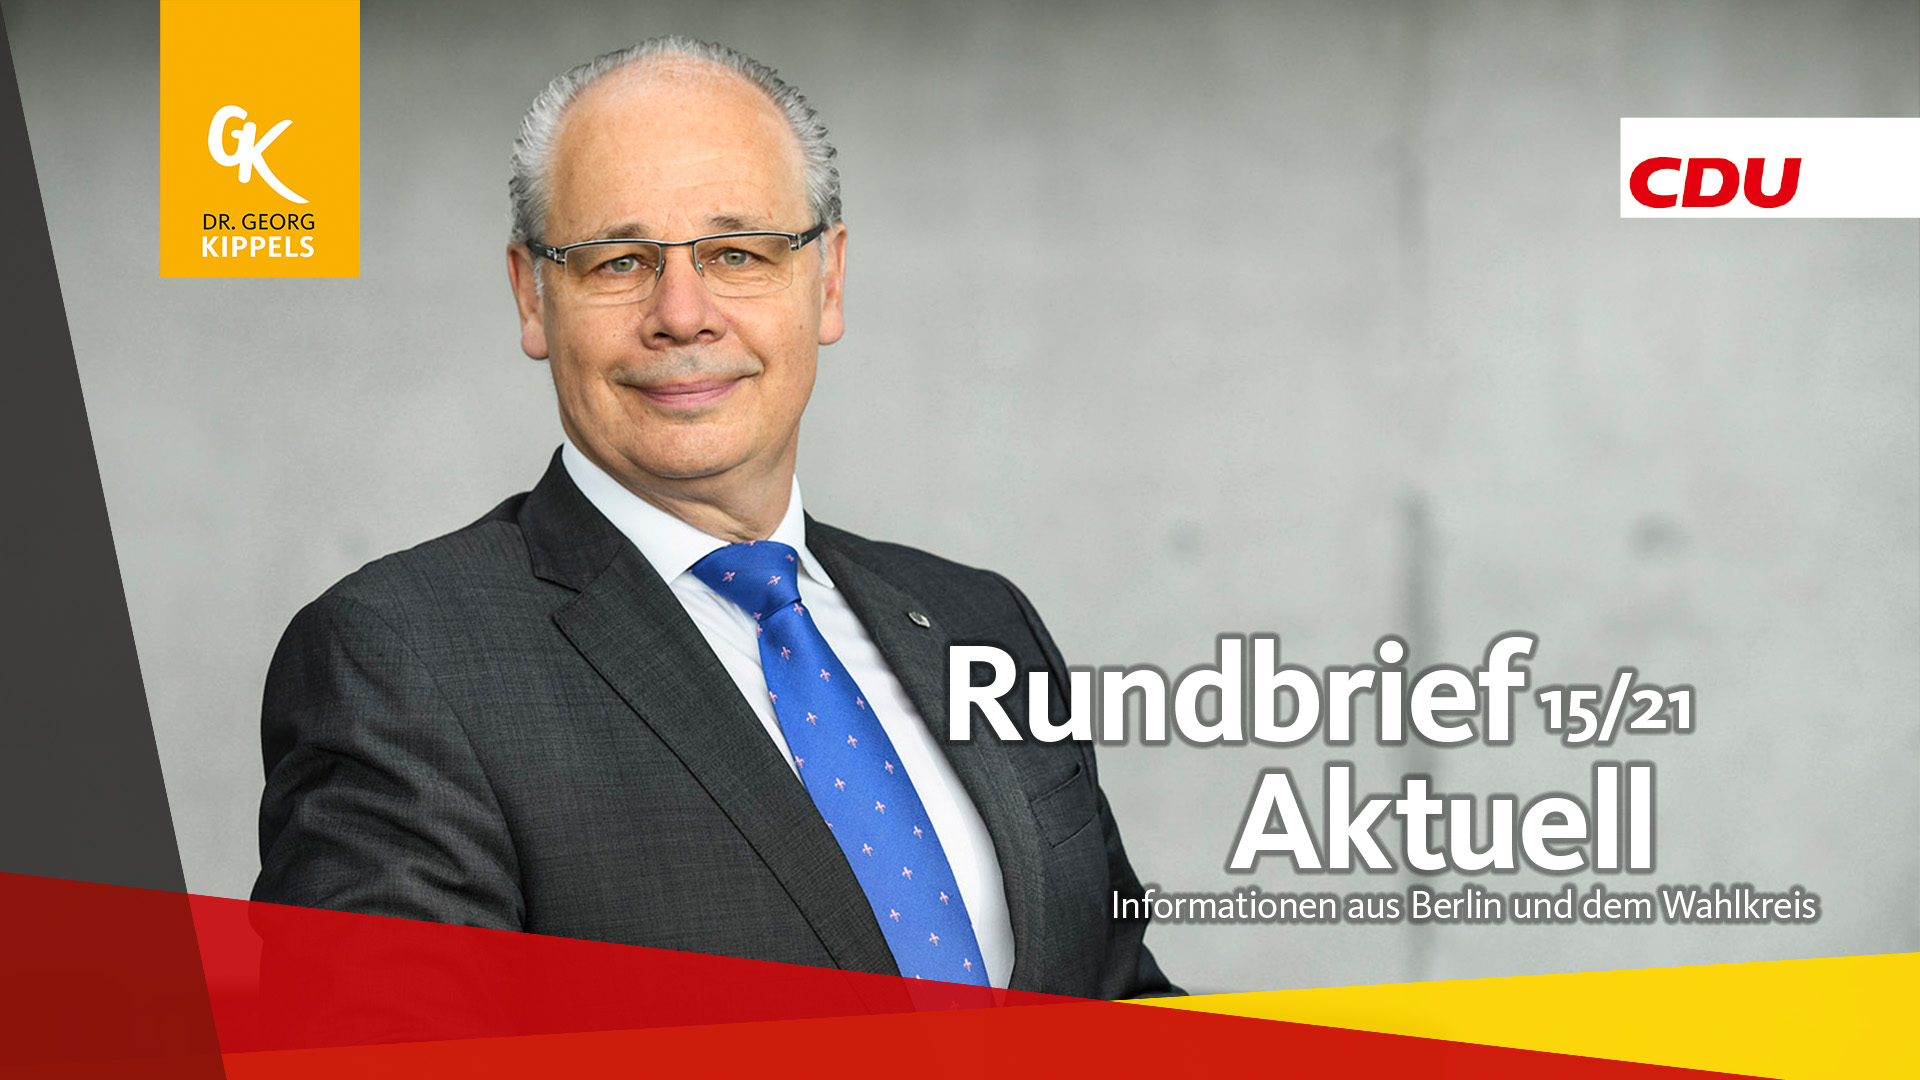 21kw15_HEAD-Rundbrief